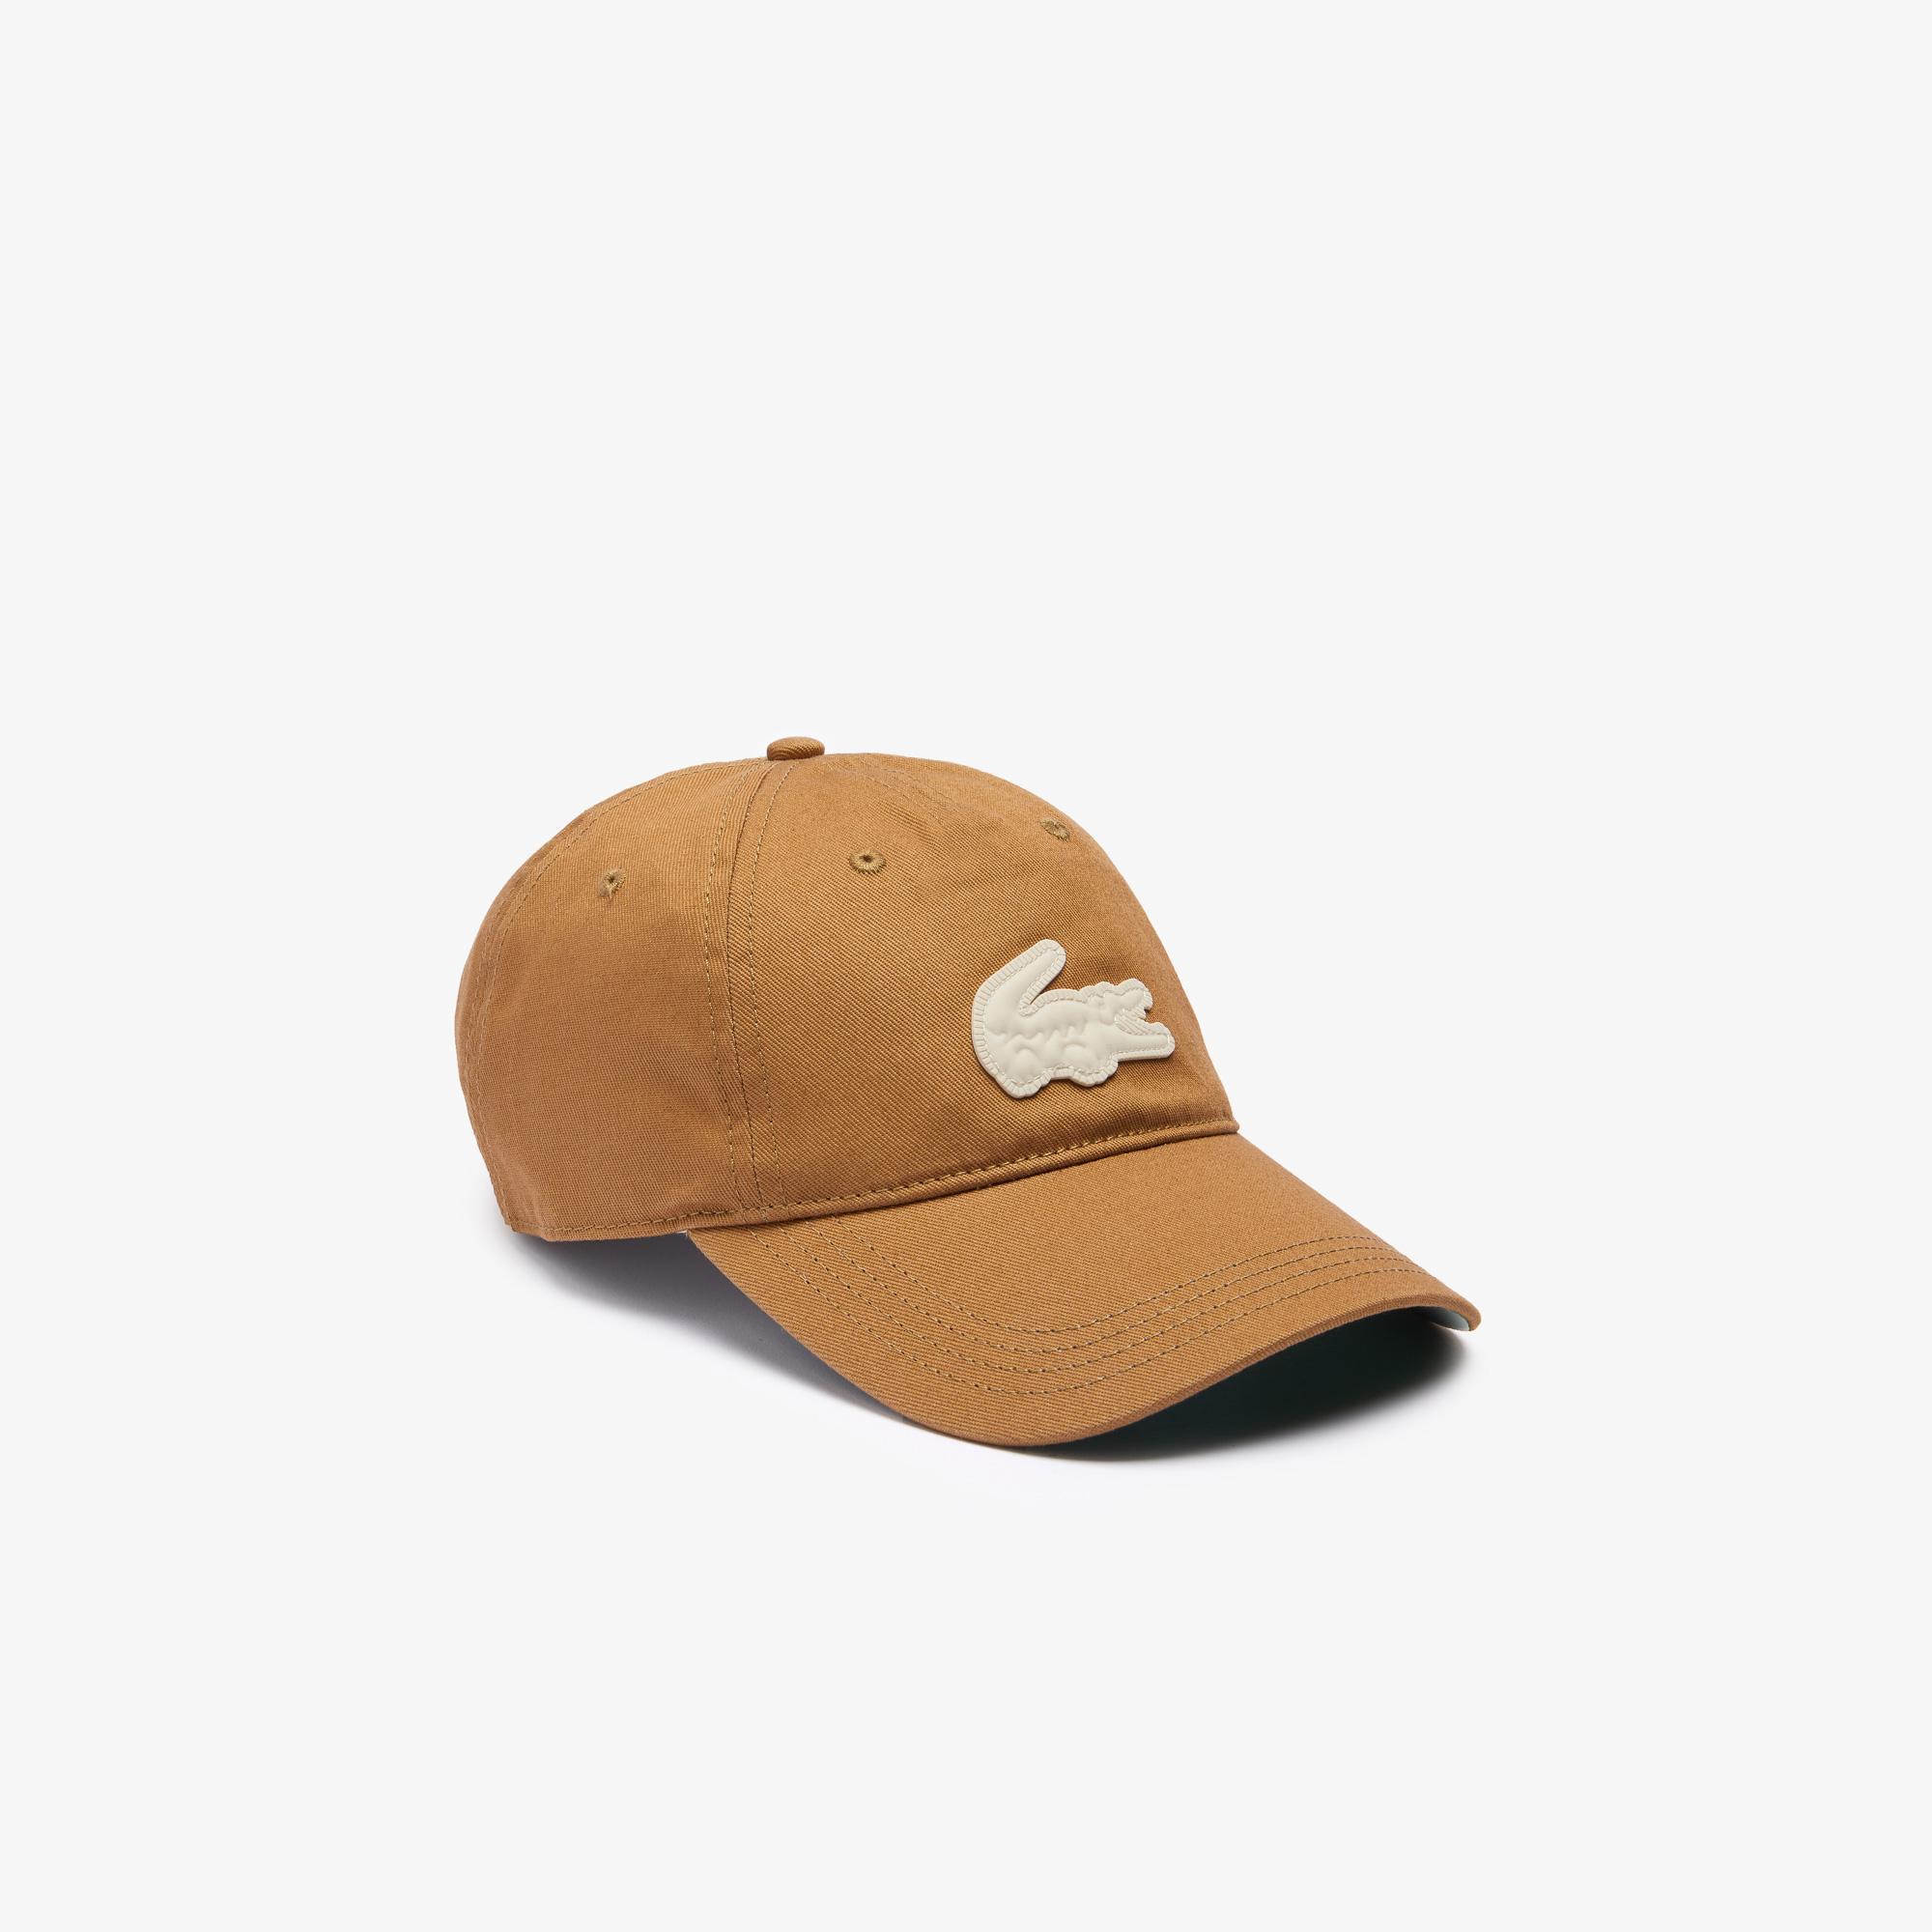 Lacoste L!ve Unisex Kahverengi Şapka